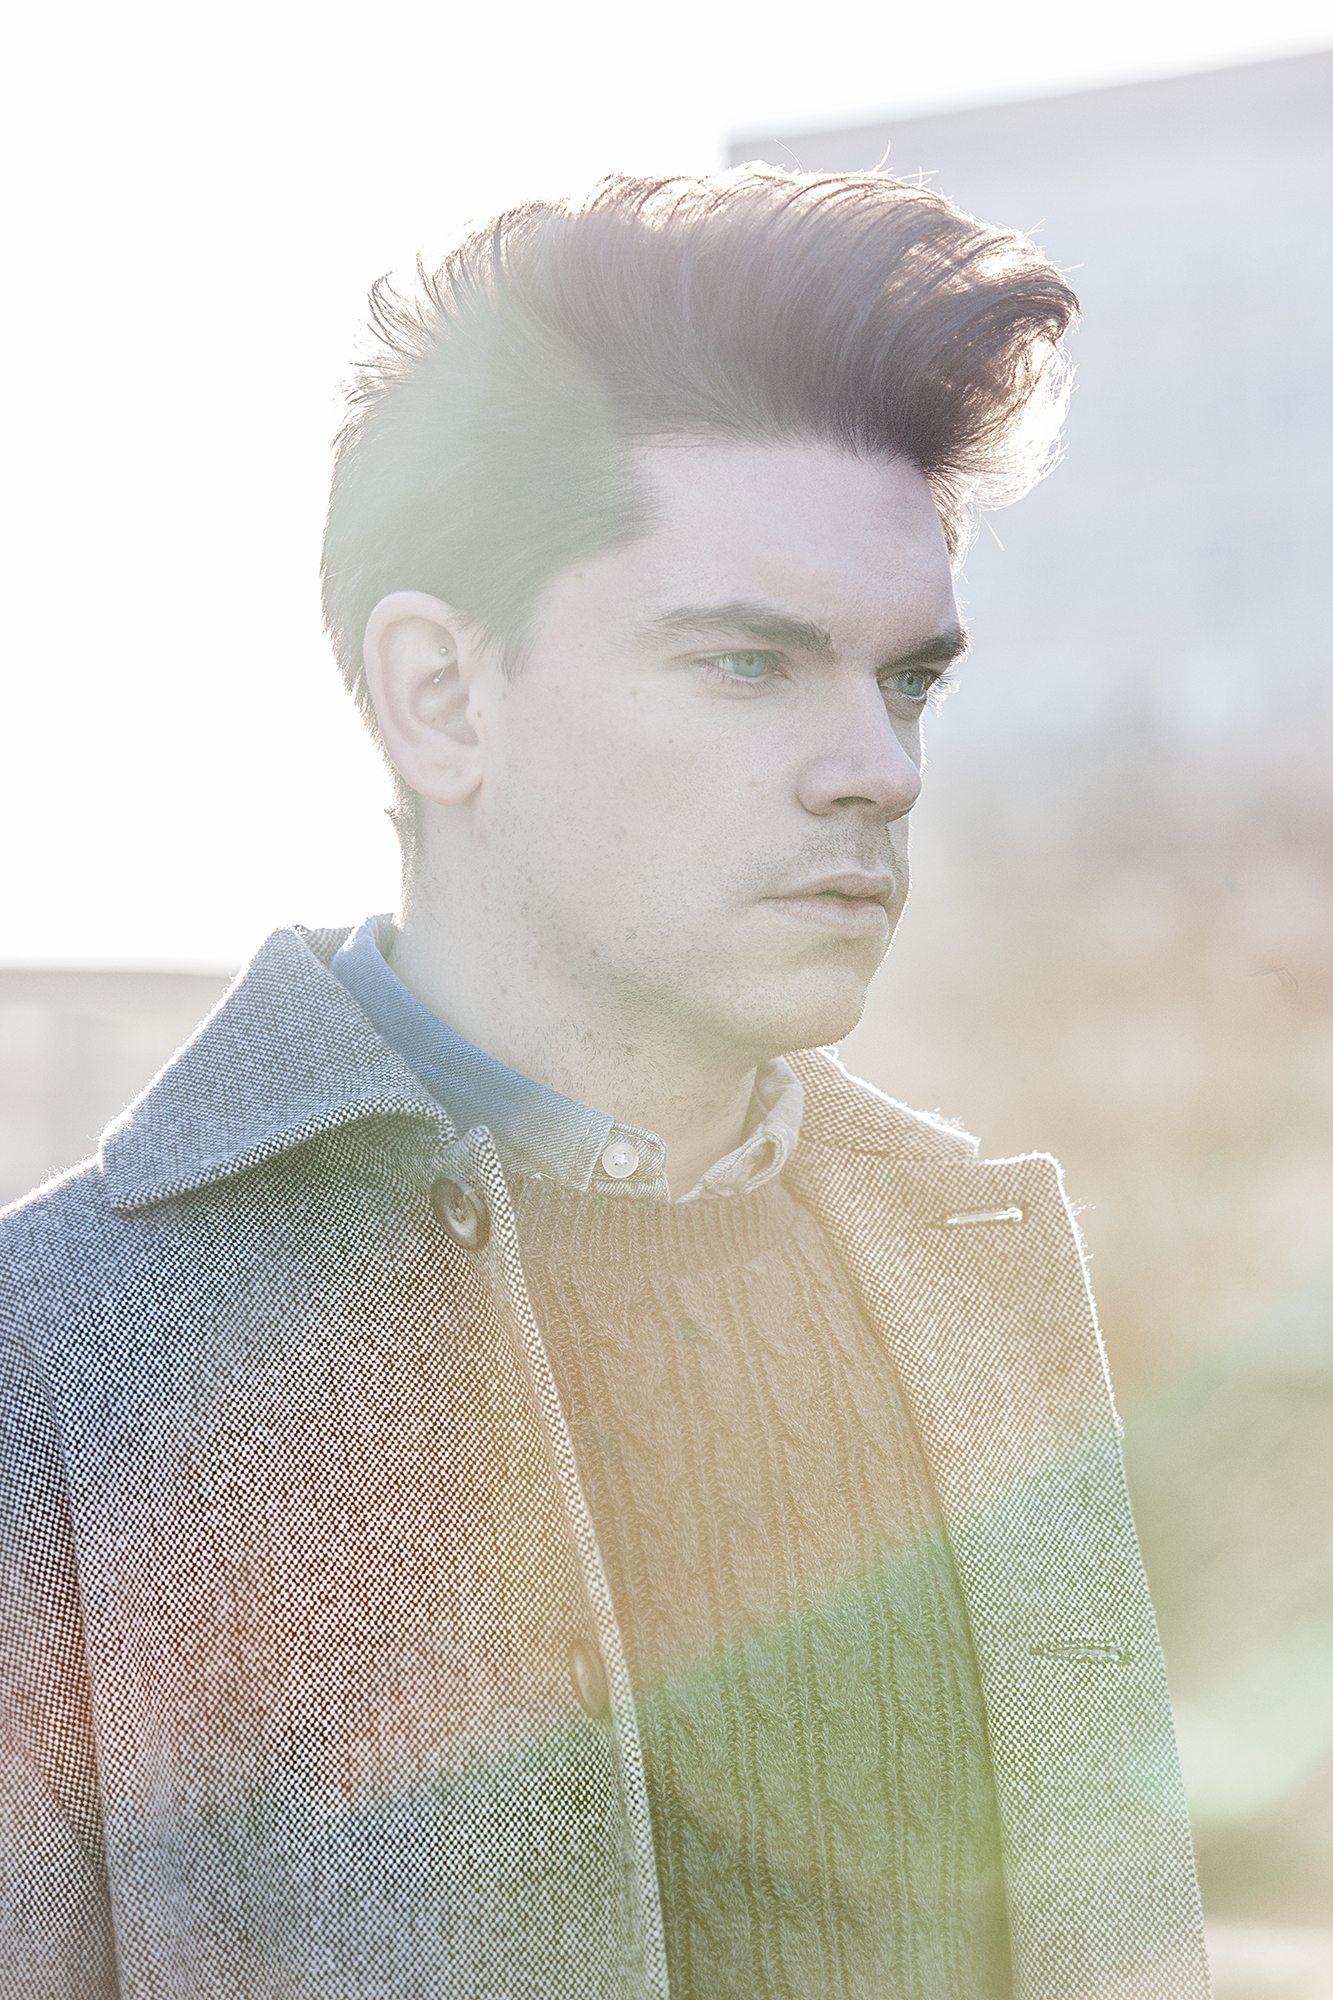 Robin_James_The_Utter_Gutter_Topman_Clothes_Winter_Shoot_Grey_Coat_Cable_Knit_Denim_Shirt_Headshot